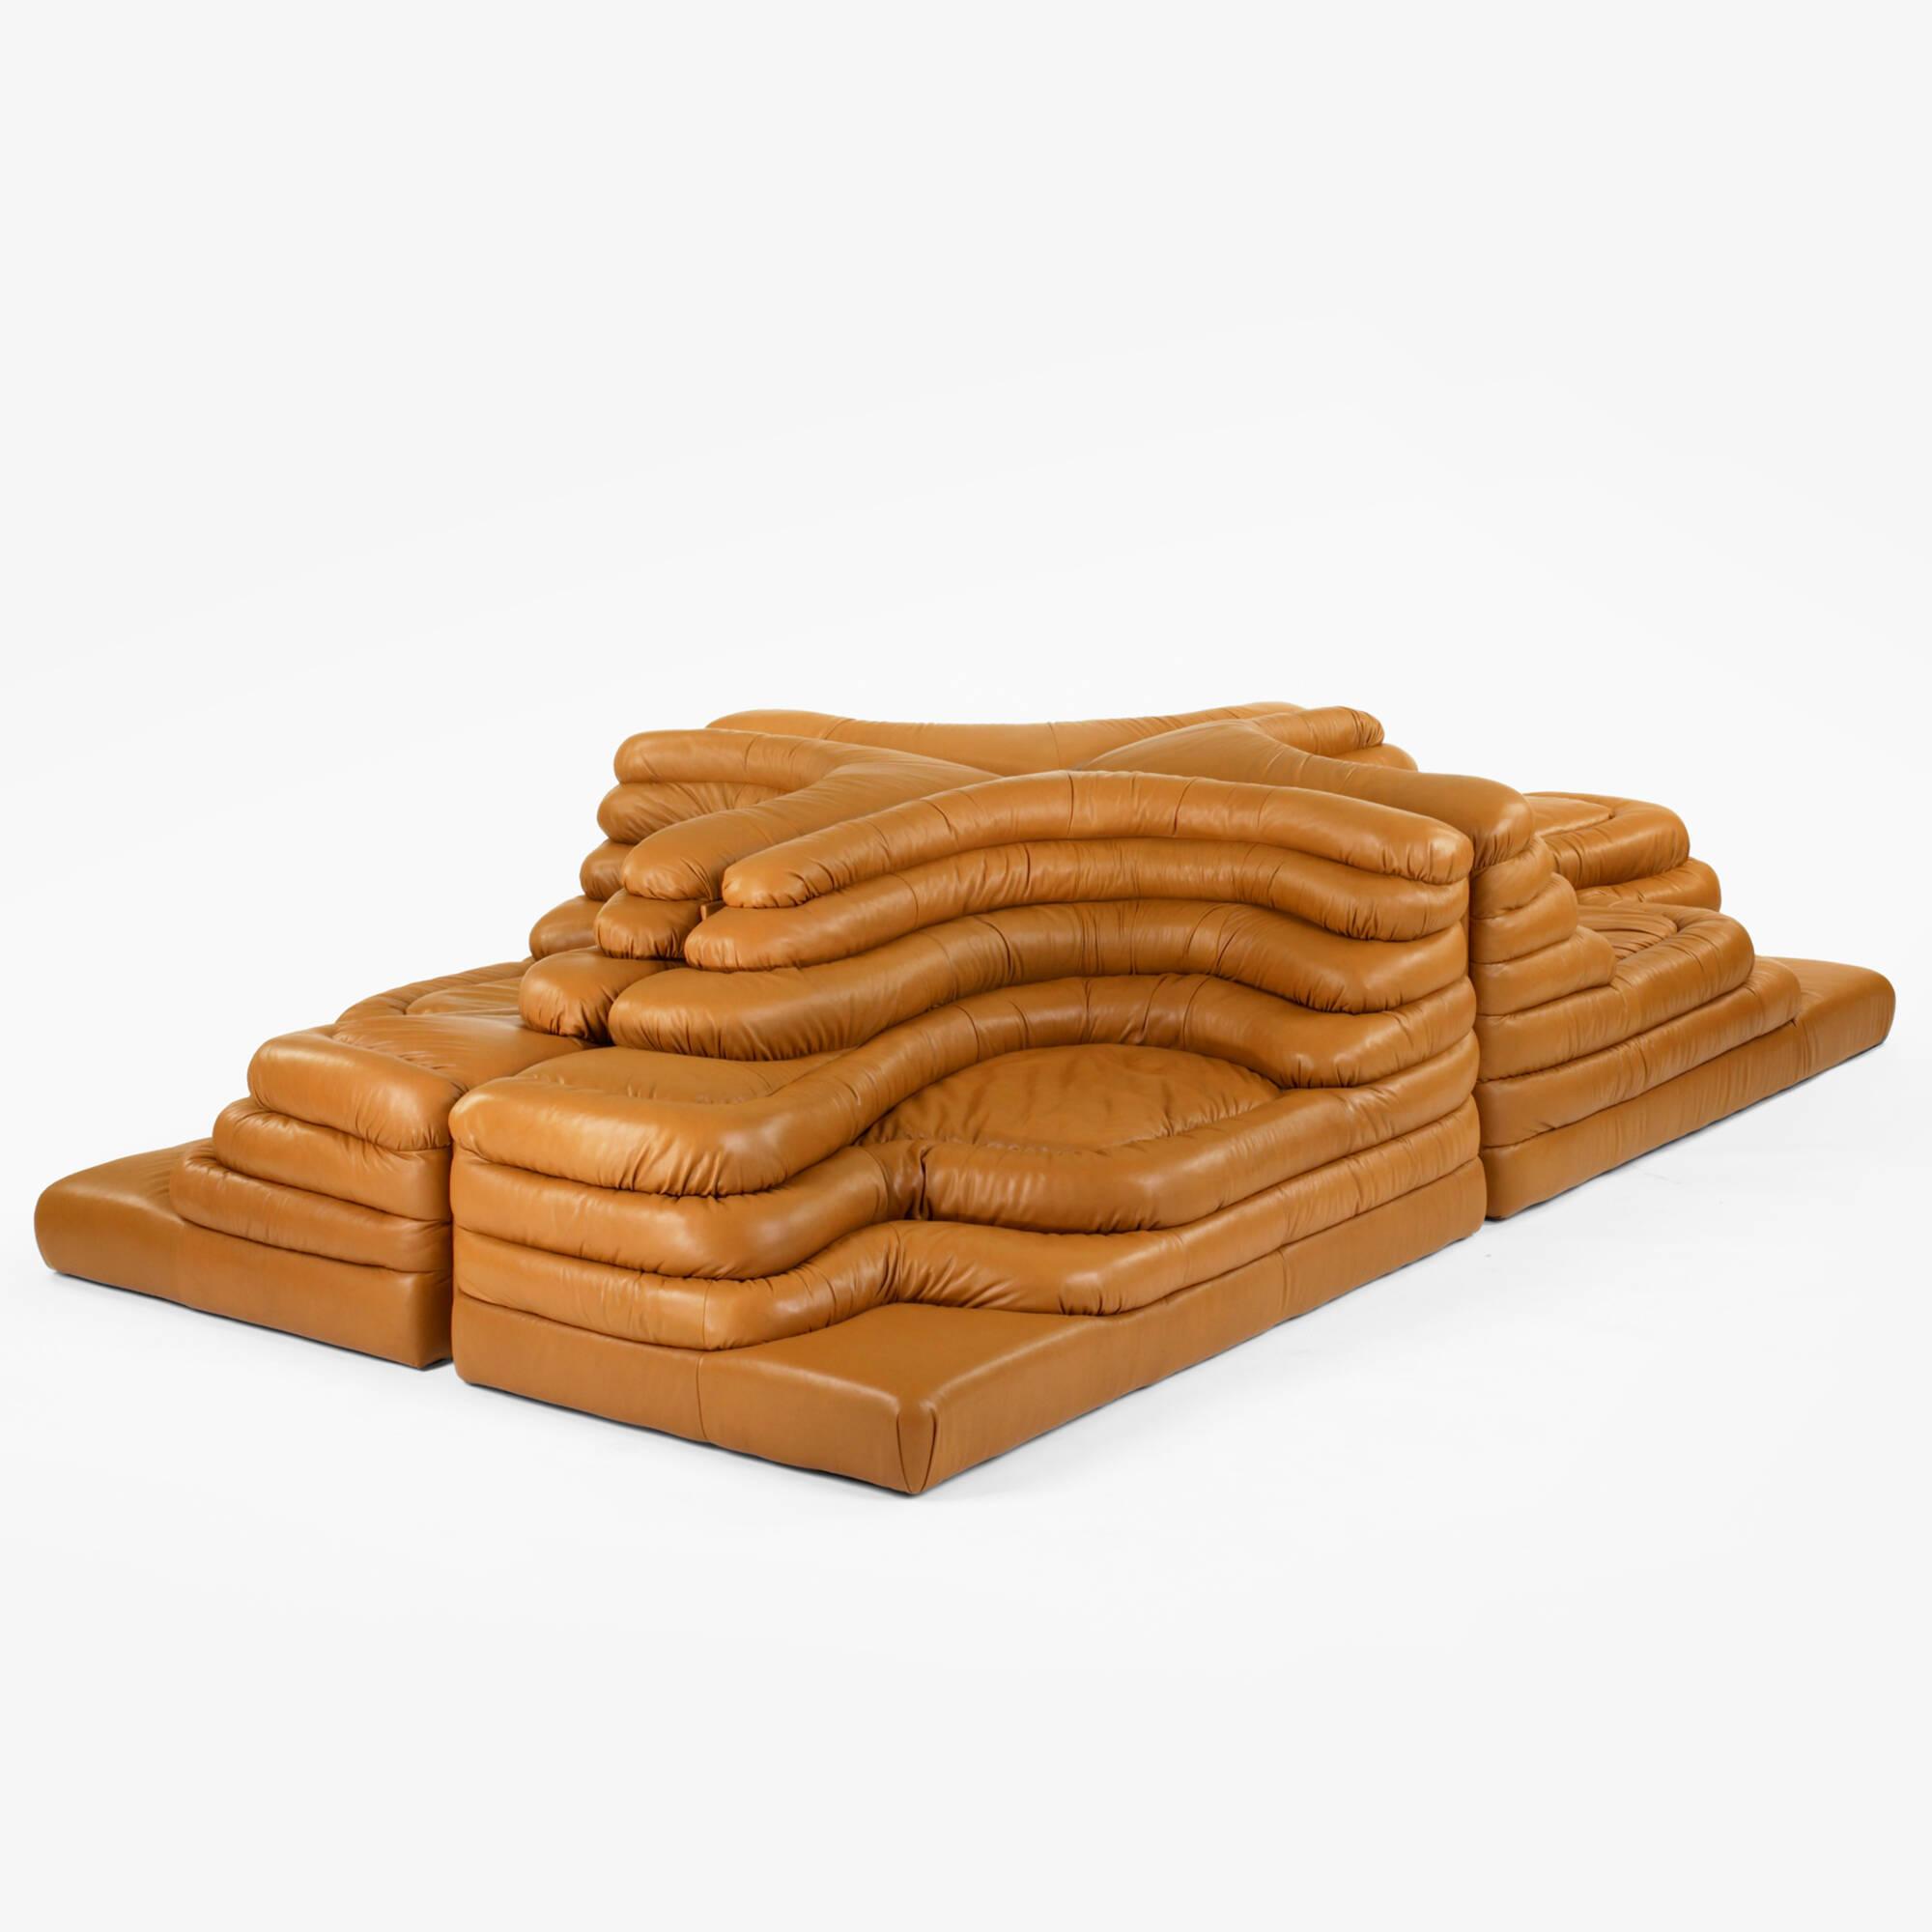 107 Ubald Klug Terrazza Furniture System Important Design 8